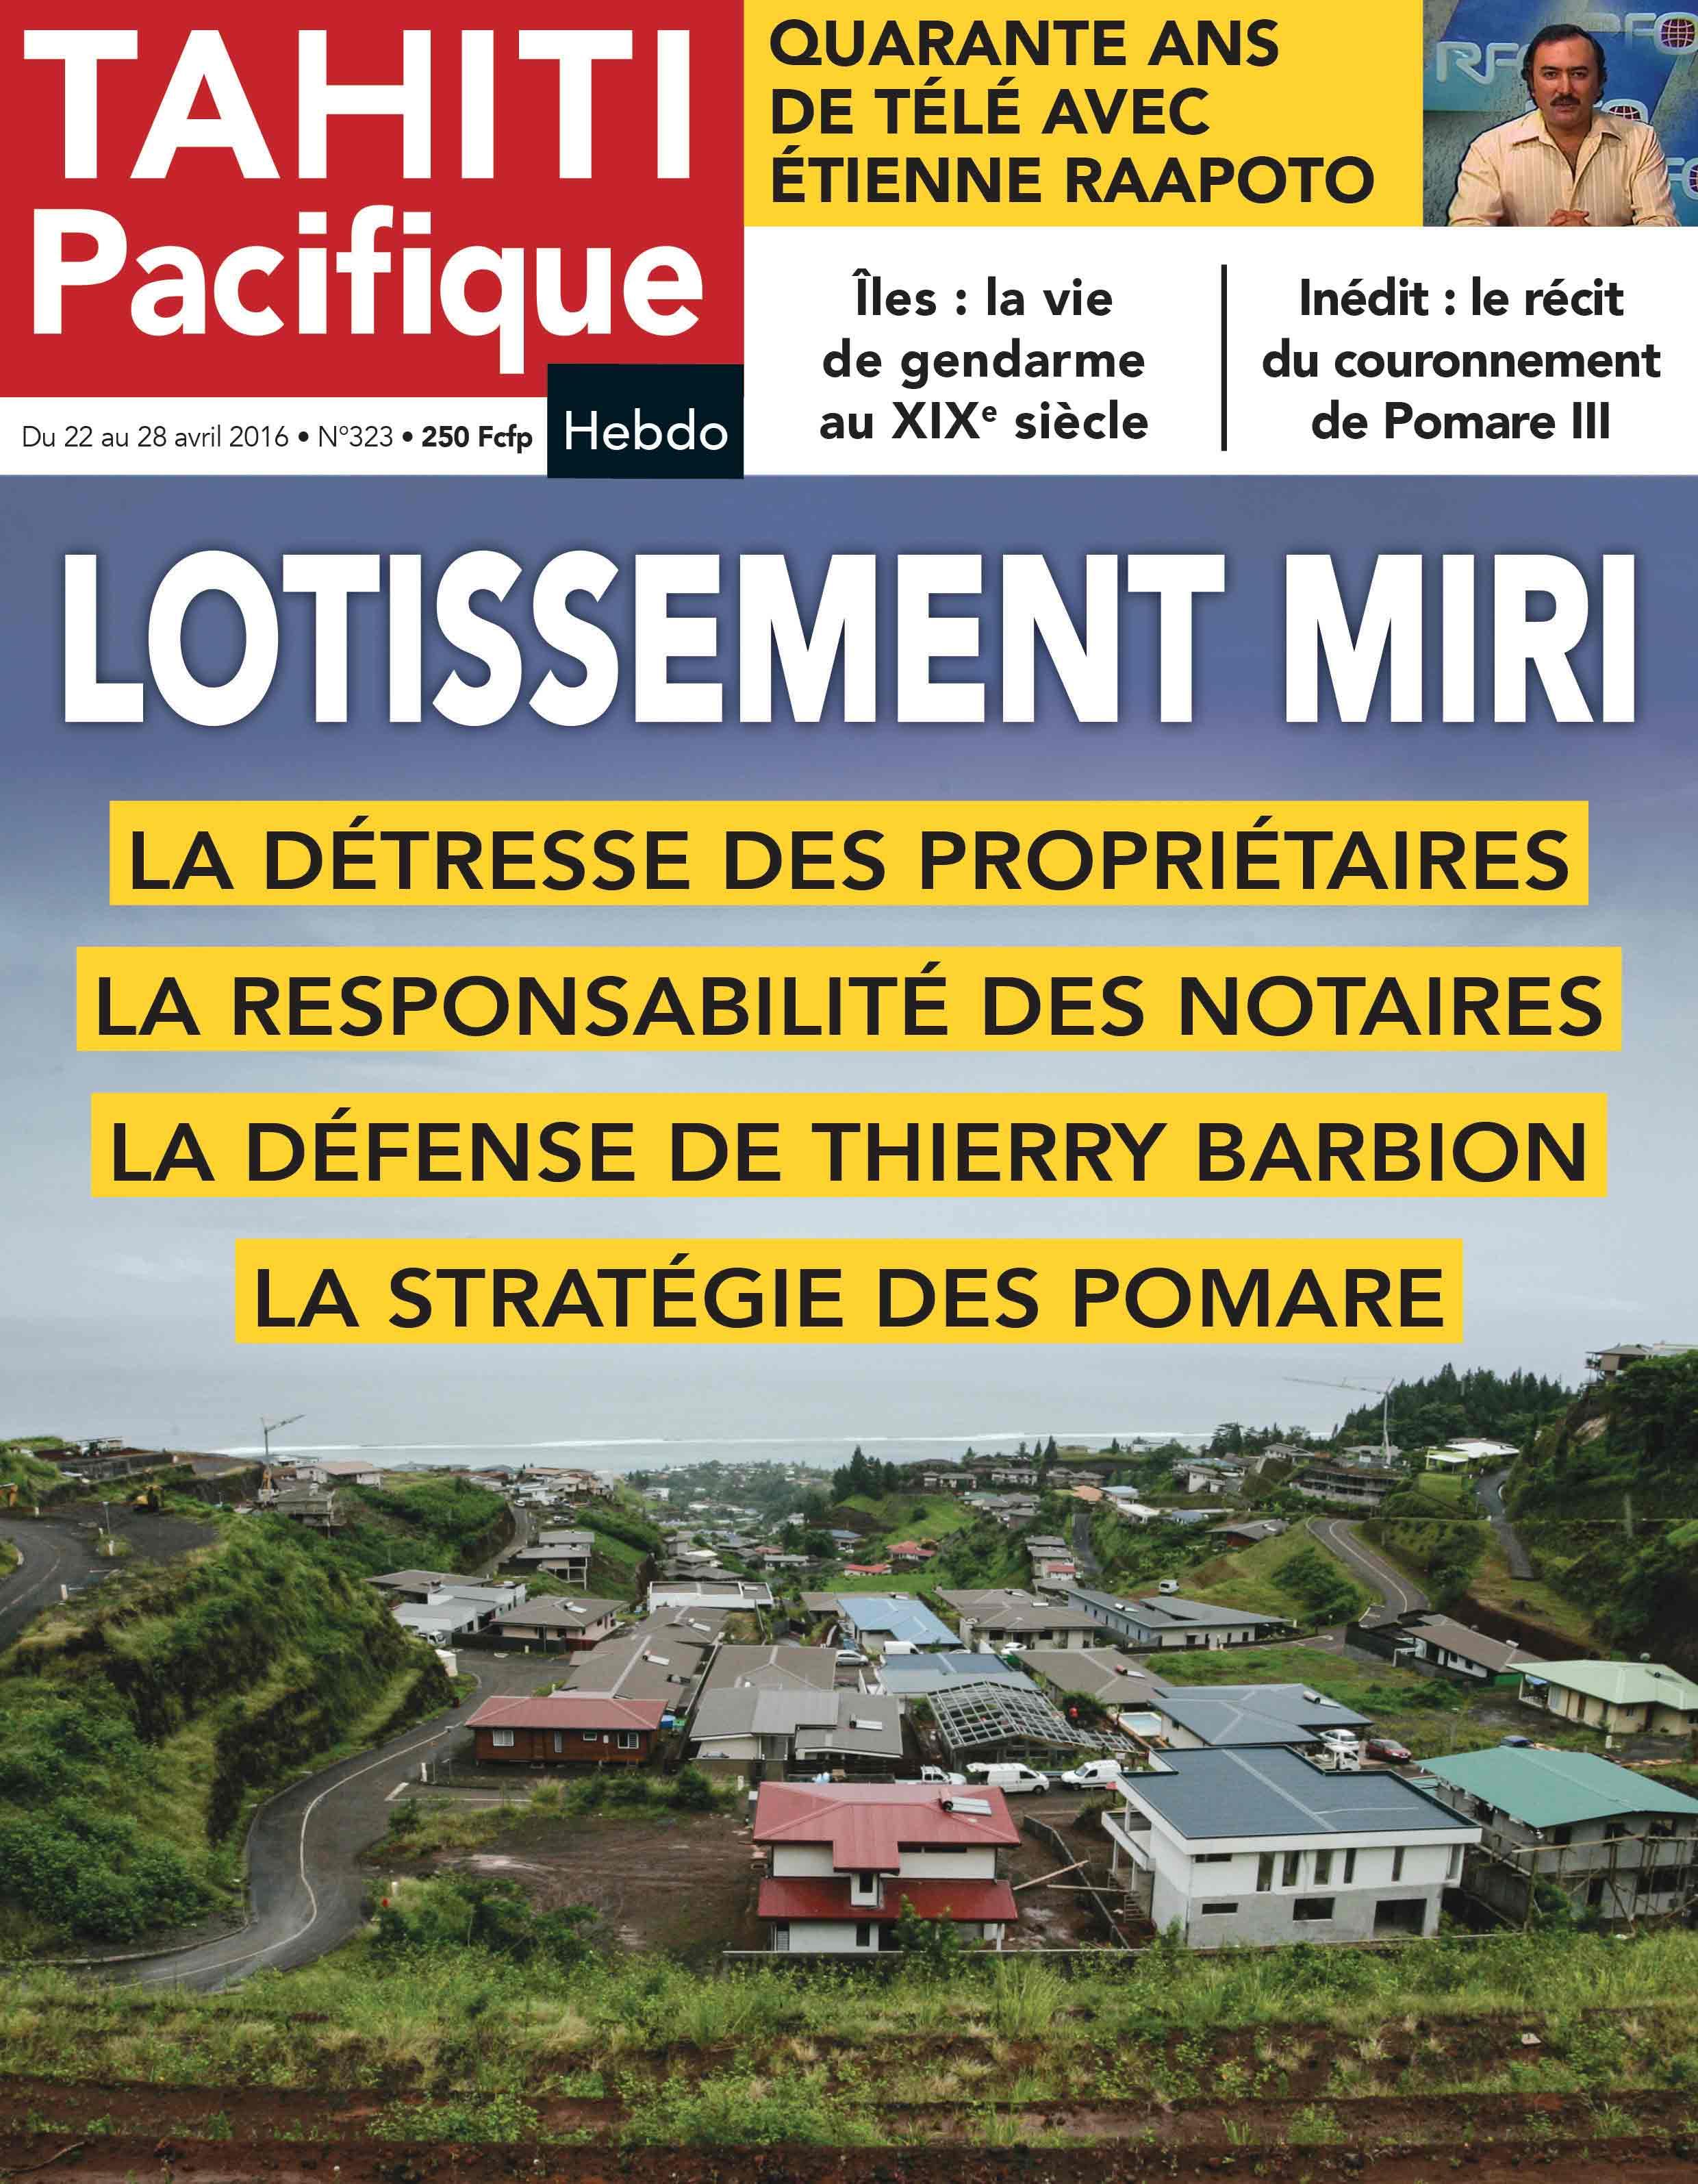 A la Une de Tahiti Pacifique Hebdo aujourd'hui